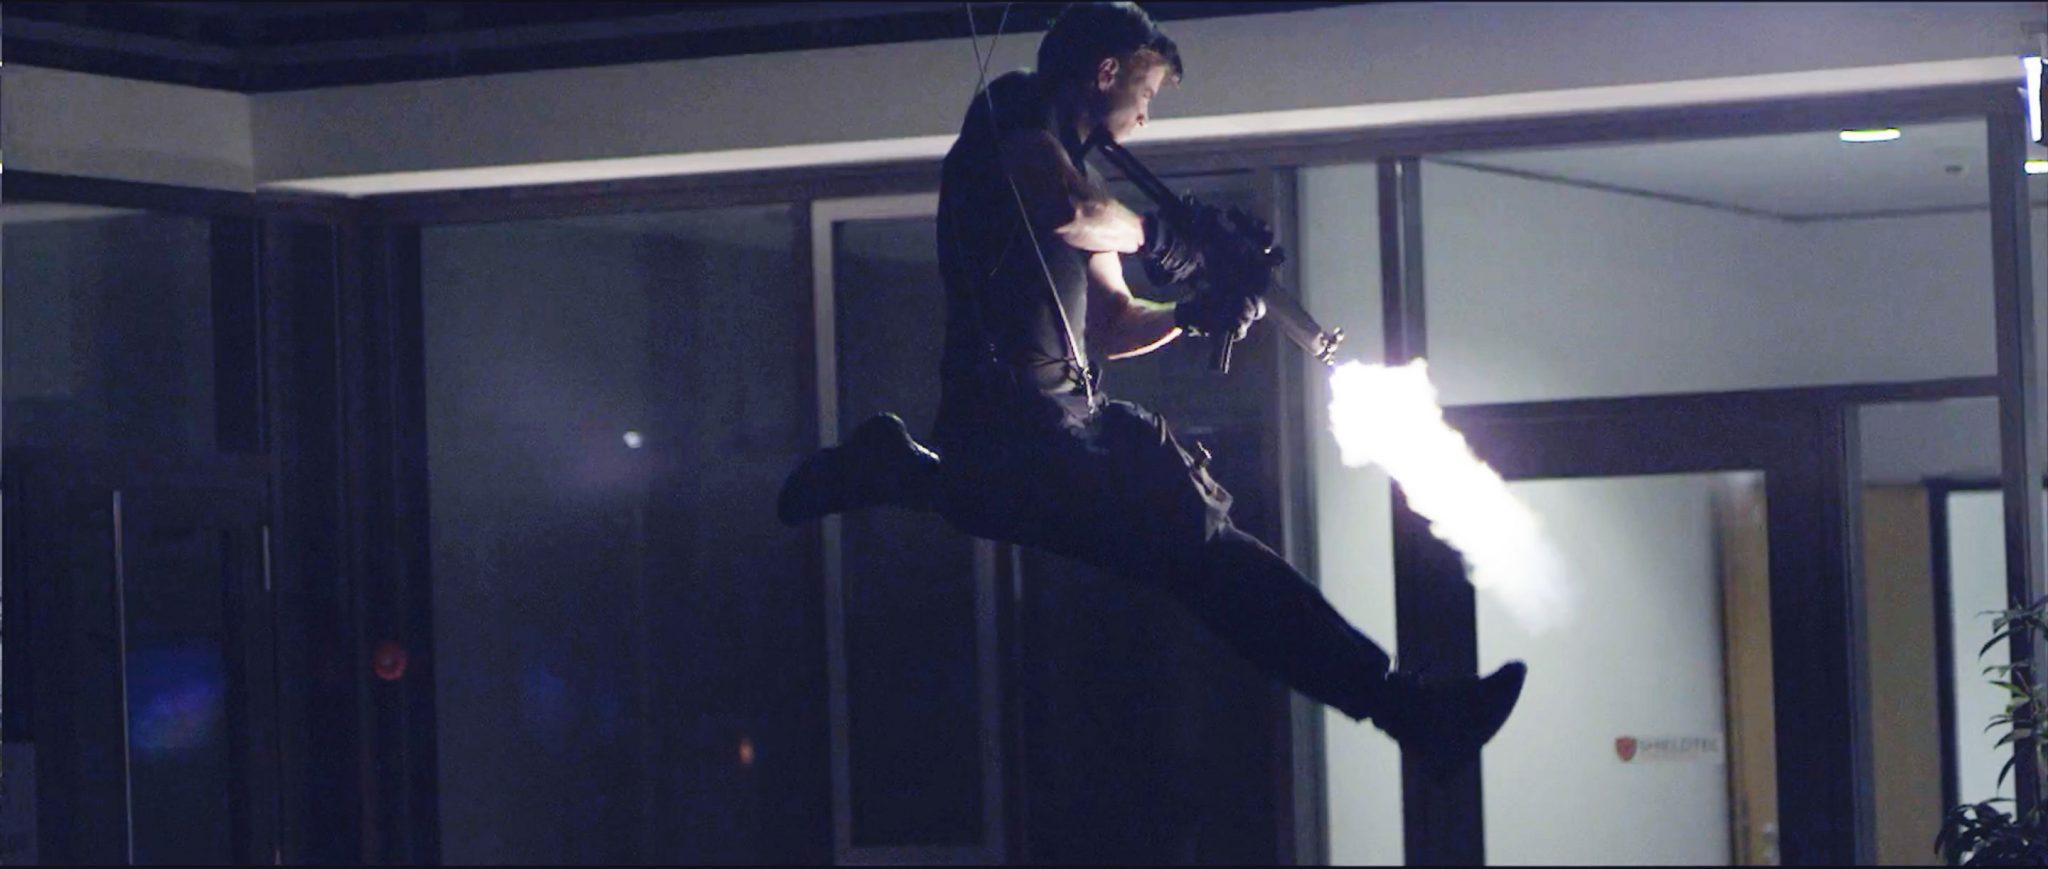 Martin Goeres, MG Action, Actor, Stuntperformer, rappeling, abseilen, action, Movie, film, stunt